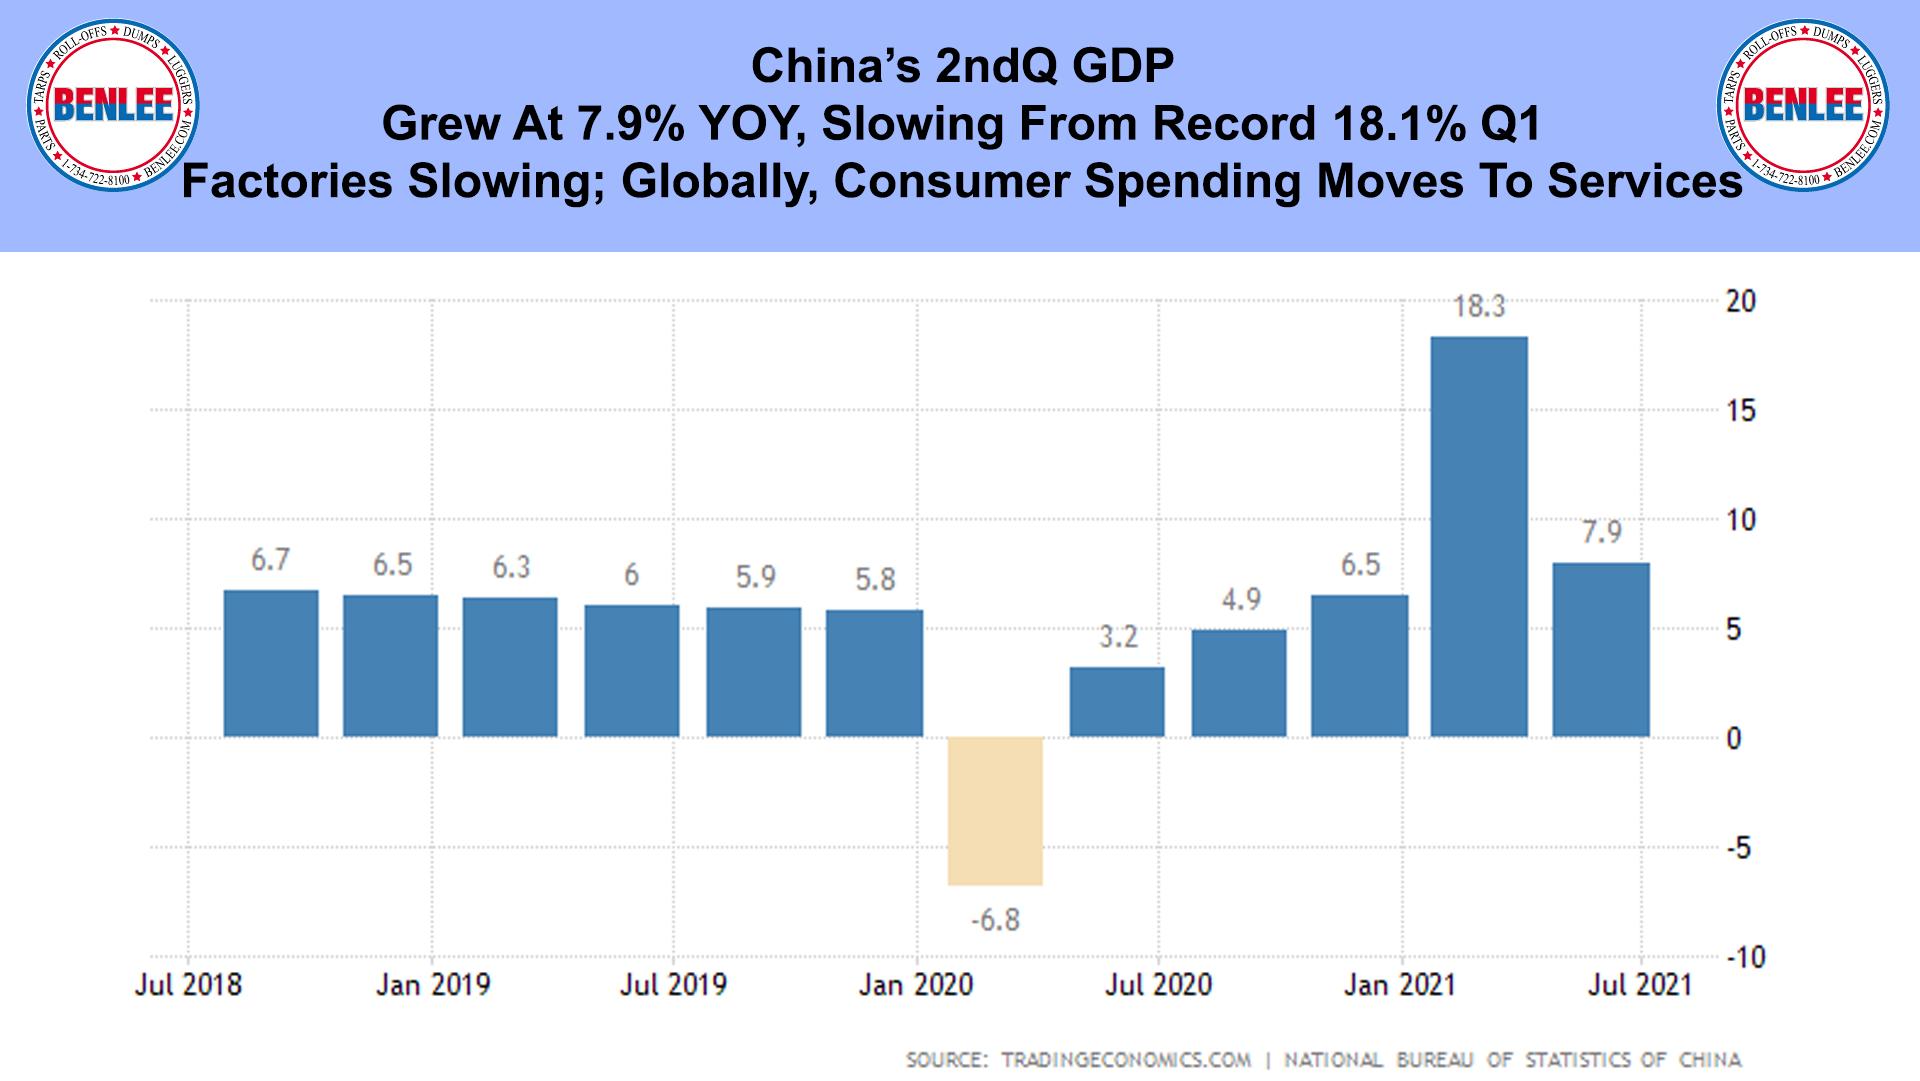 China's 2ndQ GDP